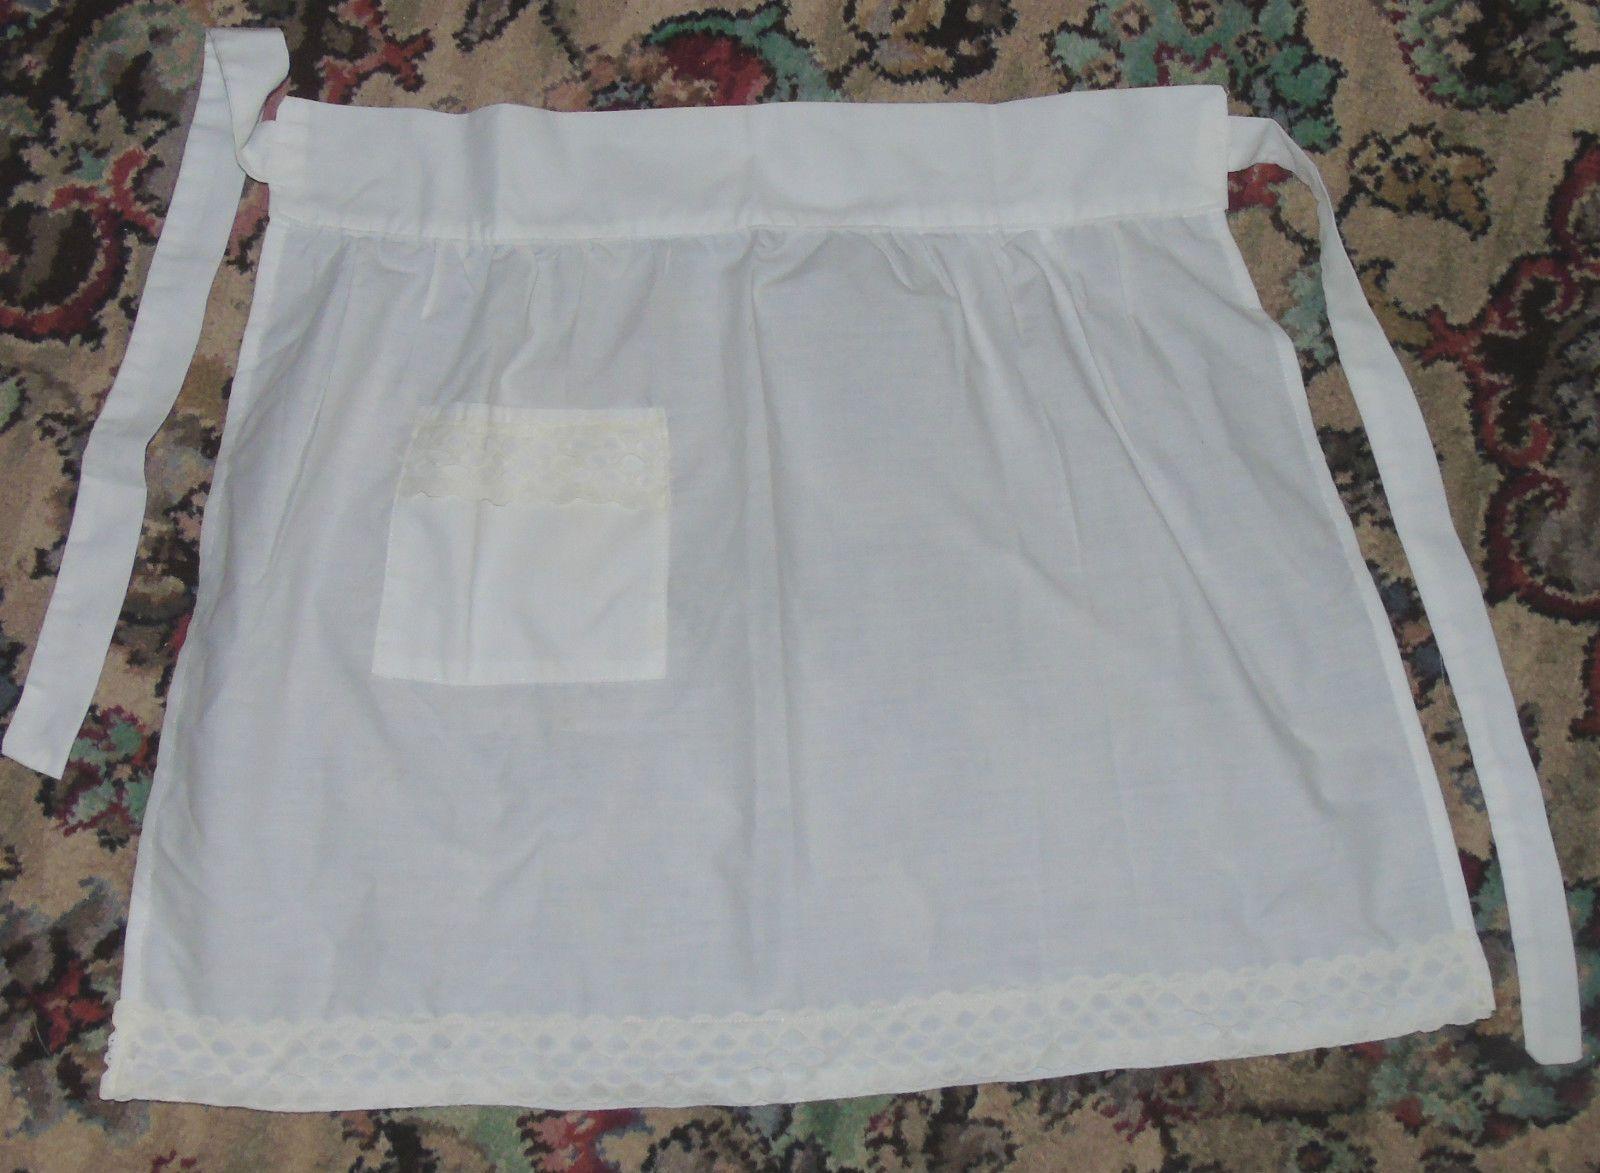 White apron ebay.ca - Pretty White Apron Retro Vintage Aprons Piny Selection Of Designs Ebay